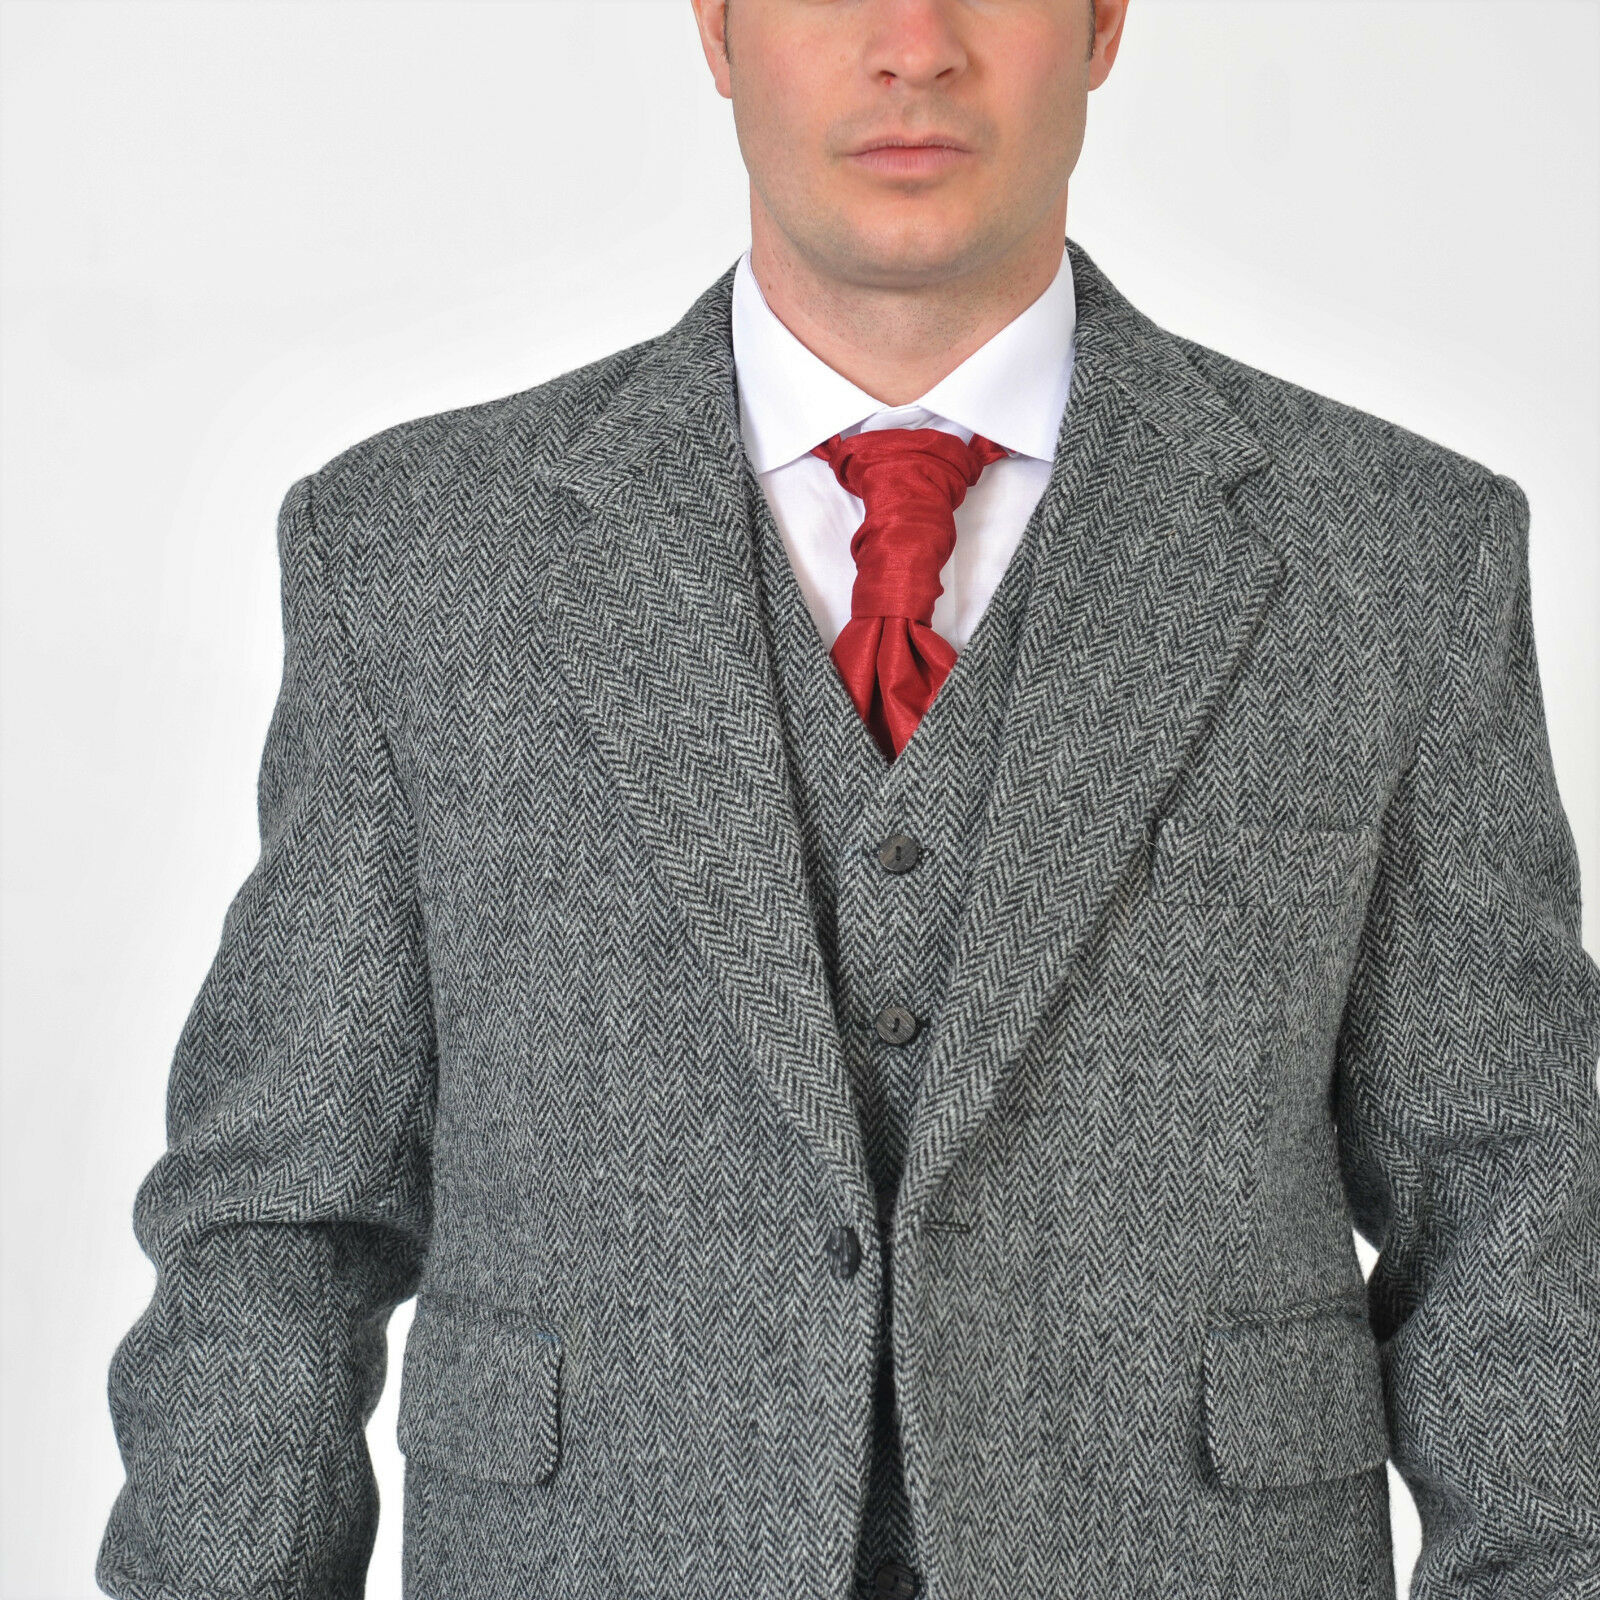 Grey Harris Tweed Laxdale Kilt Jacket & Vest Set 100% Wool,Jacket only,Vest Only